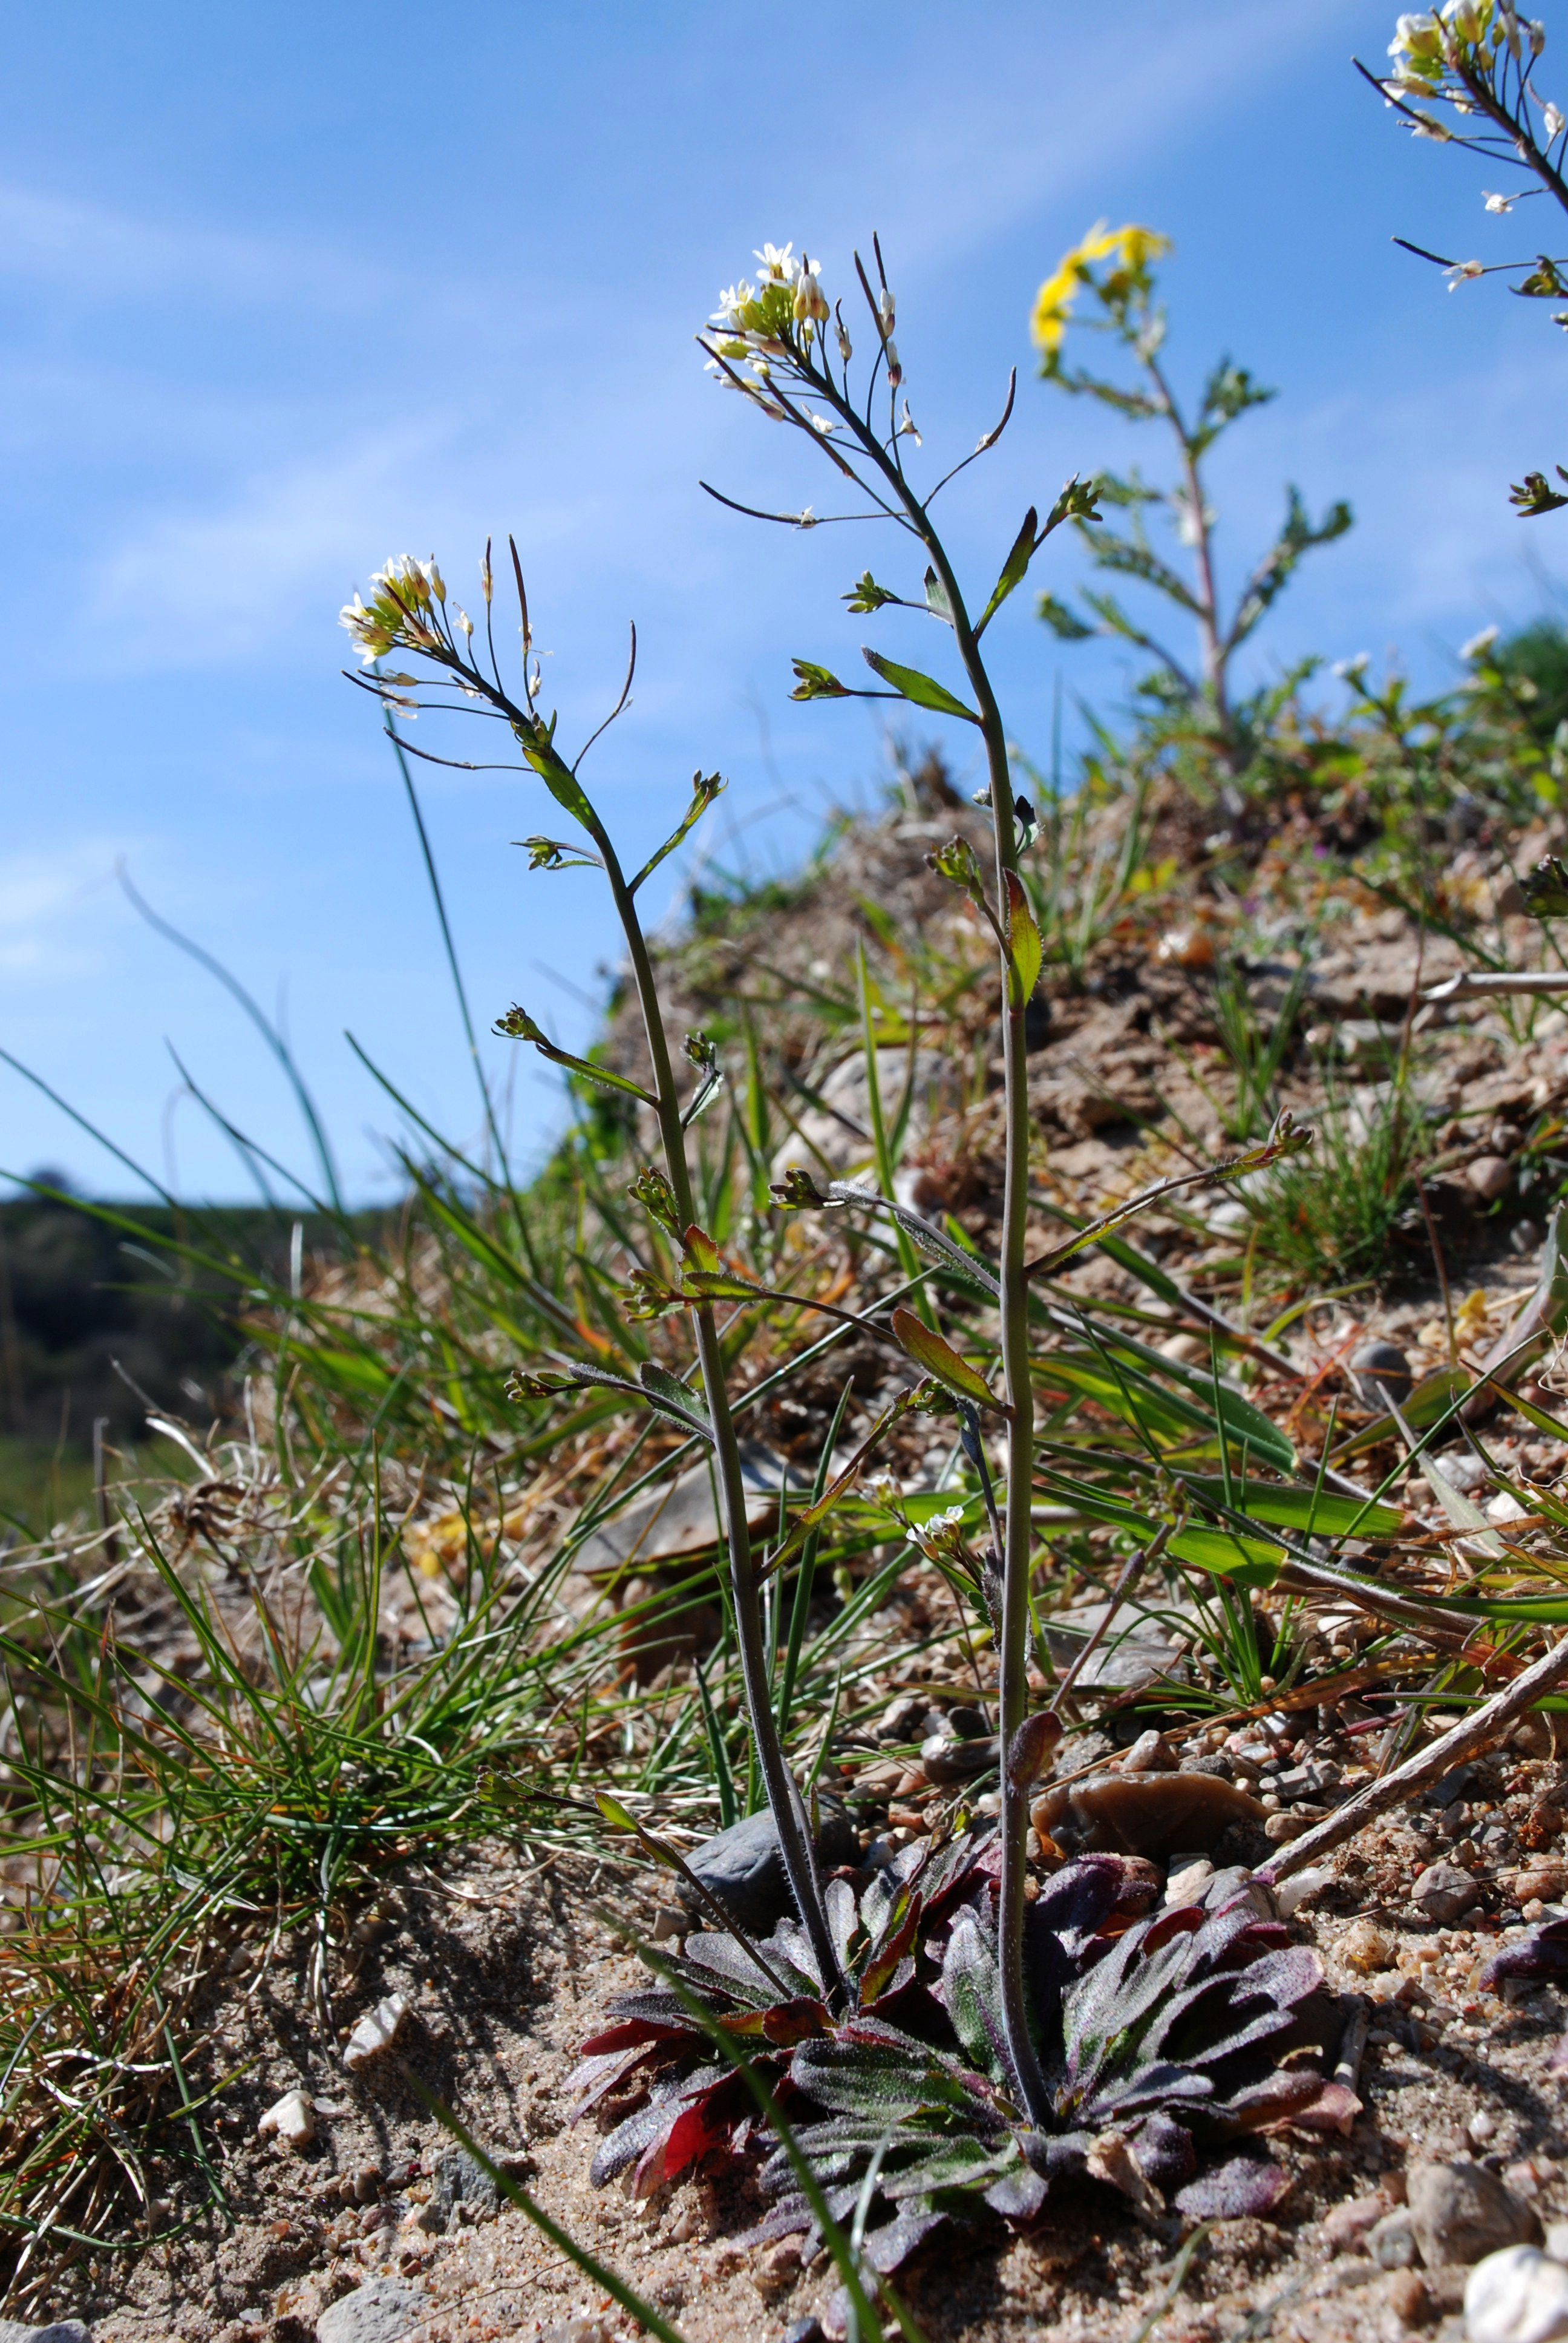 Molecular Conductors Help Plants Respond To Drought